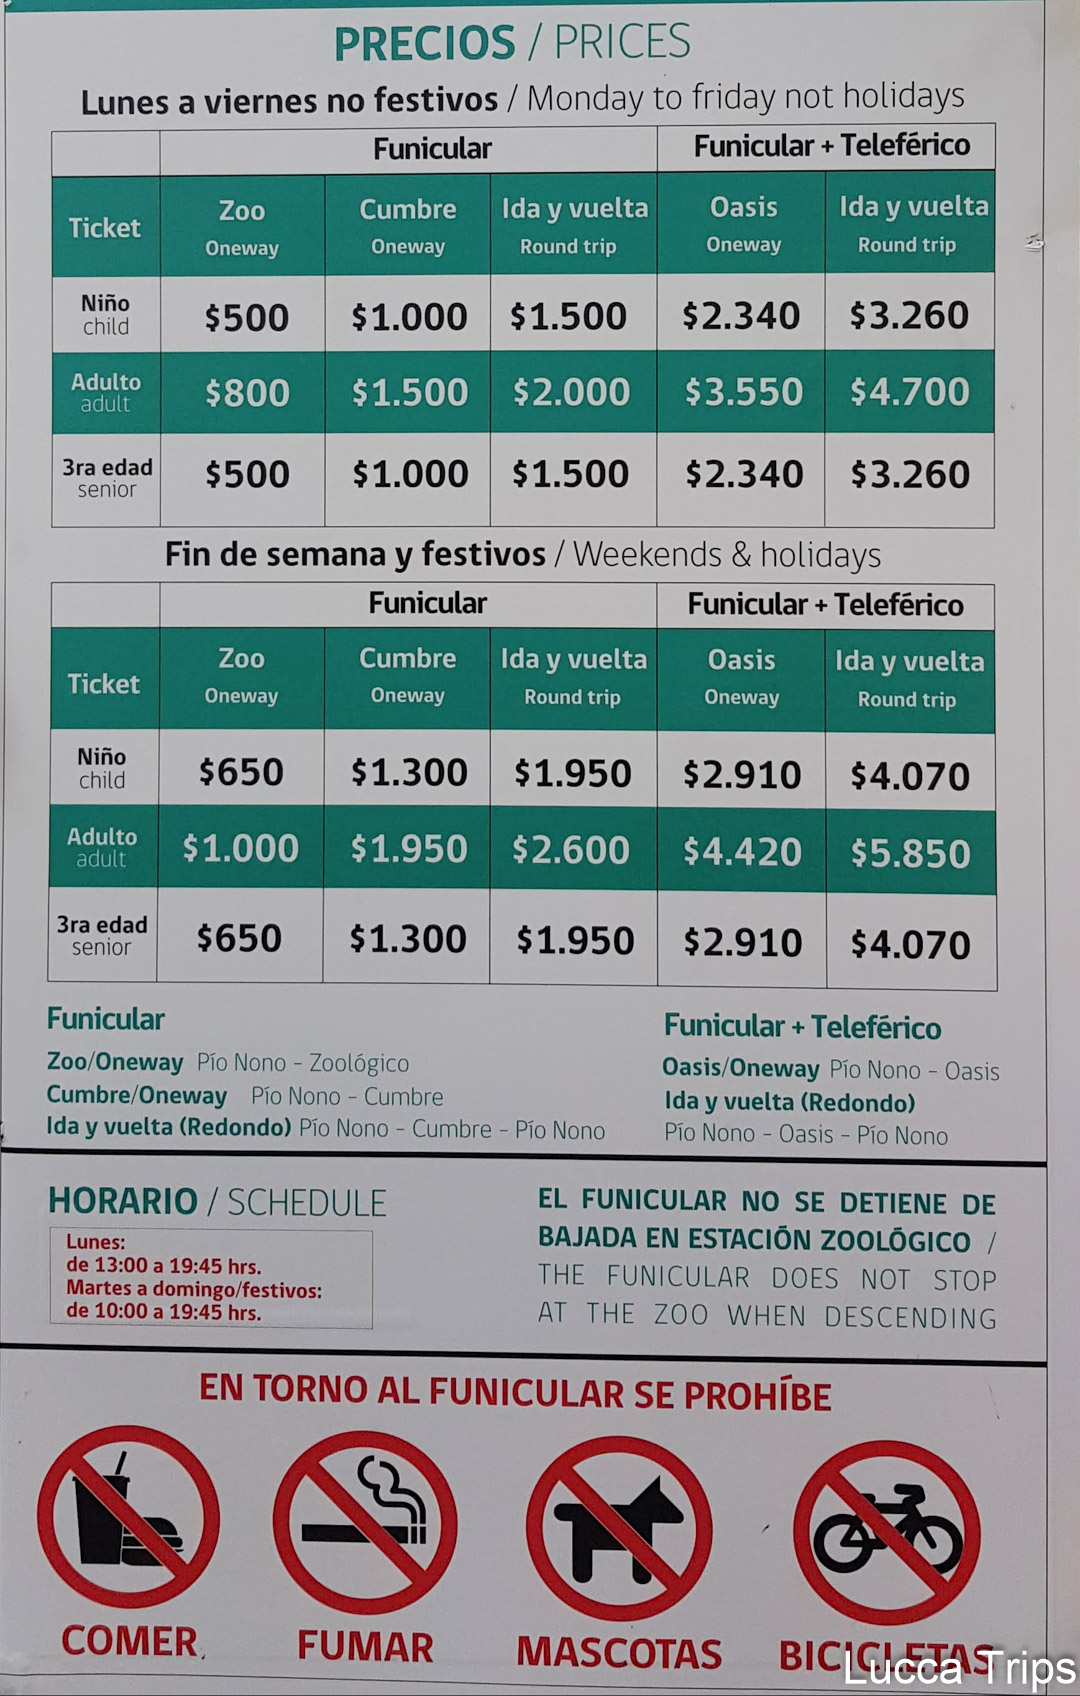 Preços teleférico e funicular San cristóbal Chile